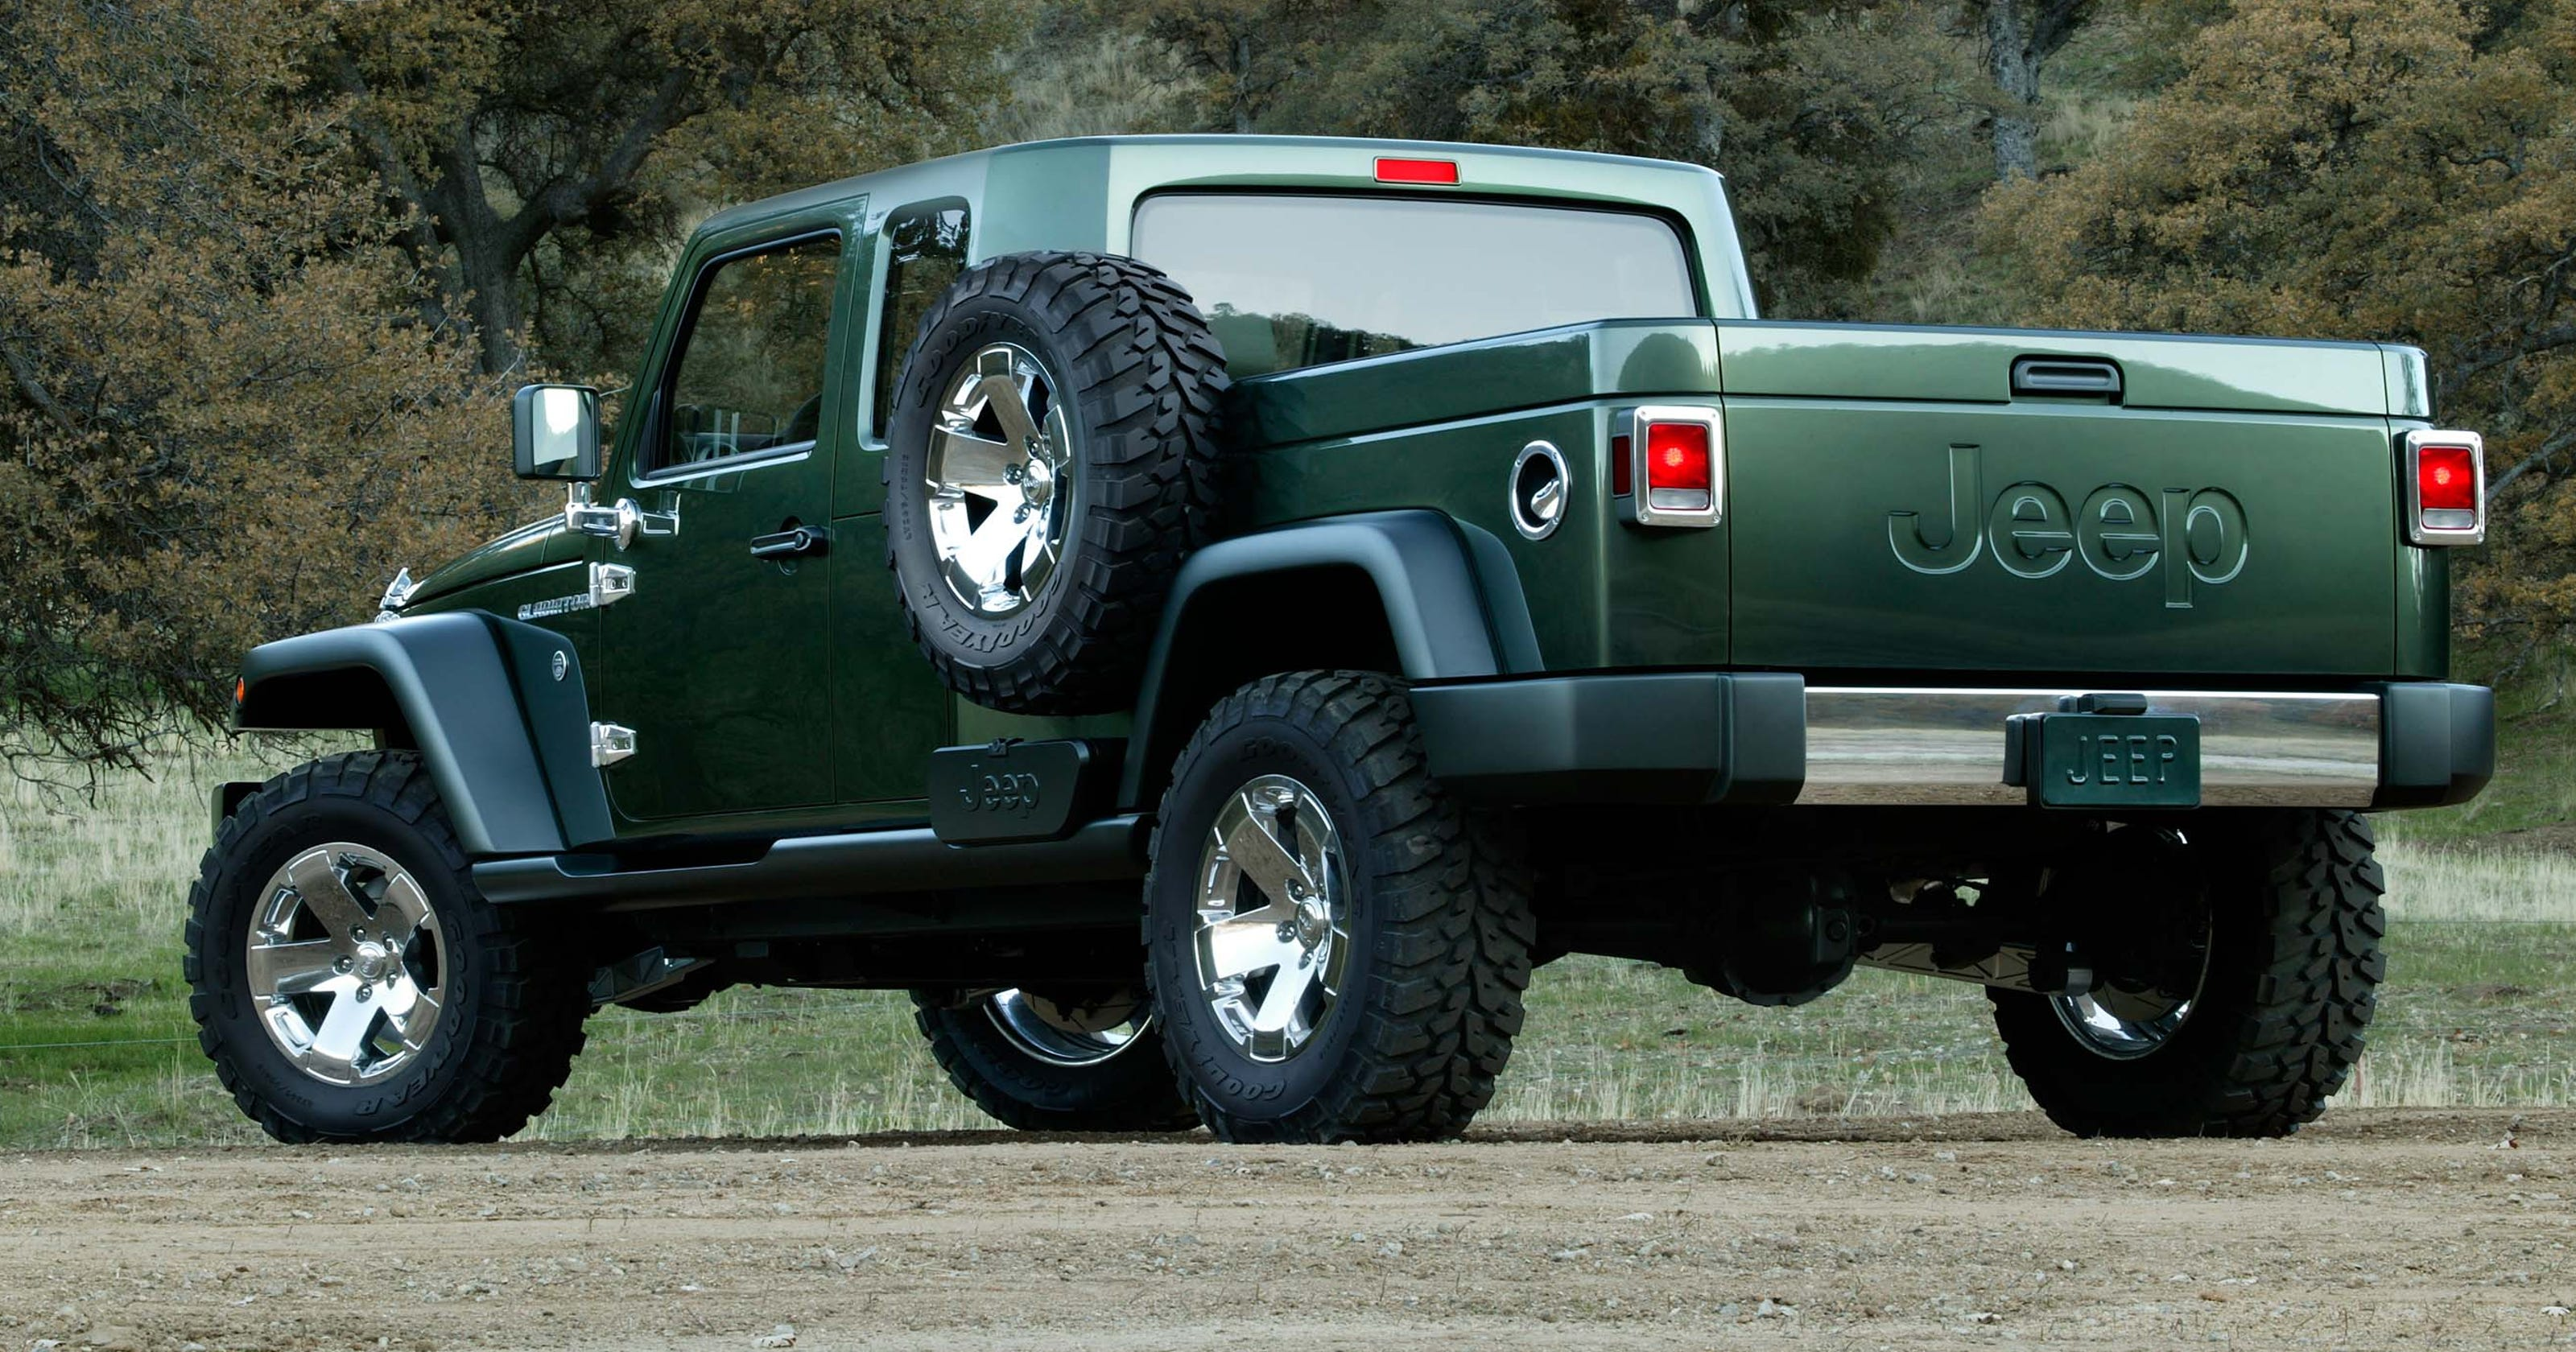 Jeep Wrangler Pickup >> Concepts Hint At Look Of Jeep Wrangler Pickup